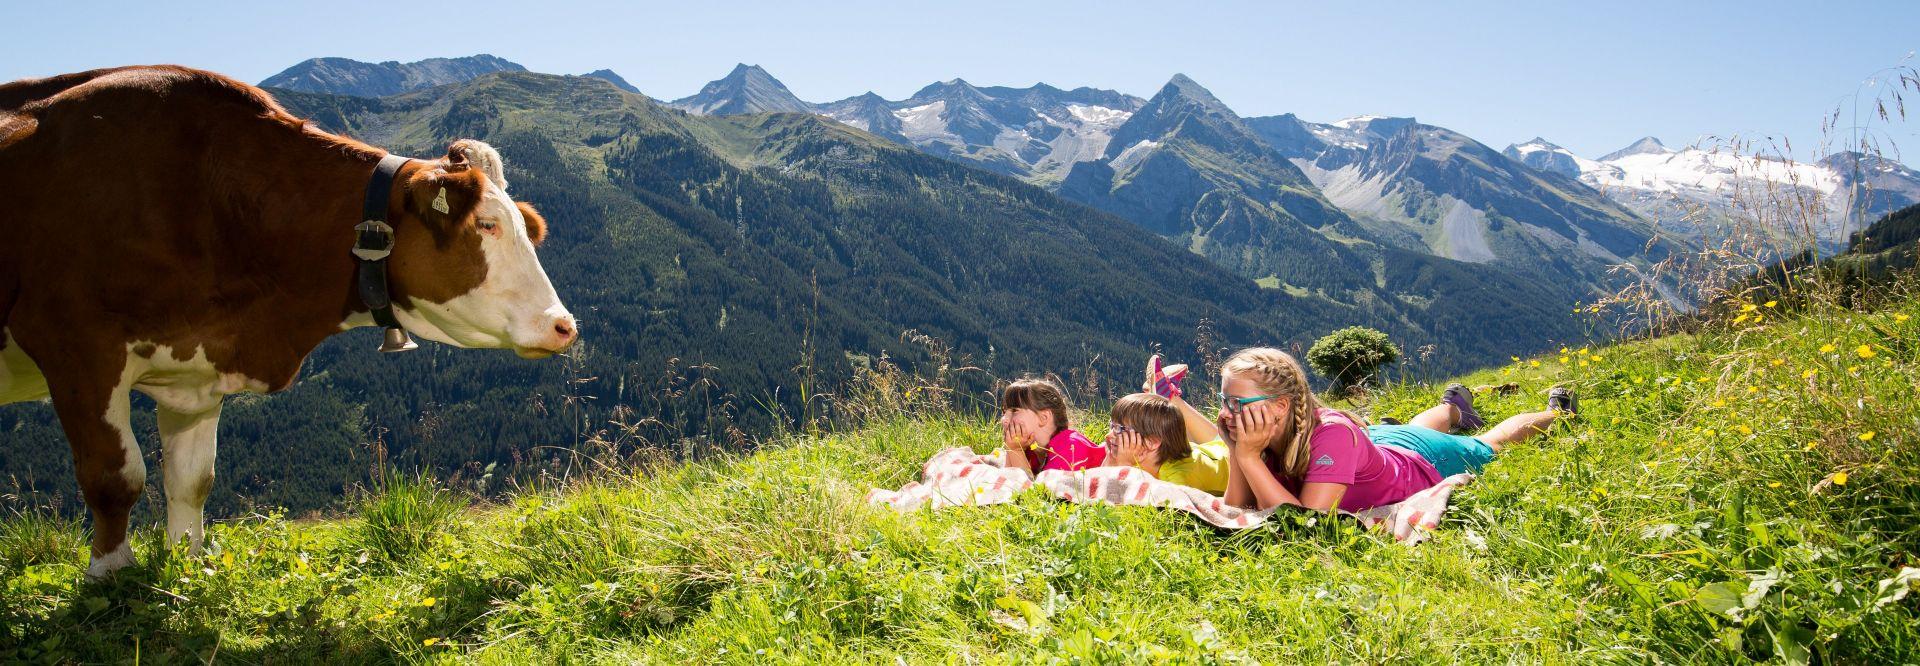 Kinder entspannen in der Wiese (c) shootandstyle.com (Tux-Finkenberg)